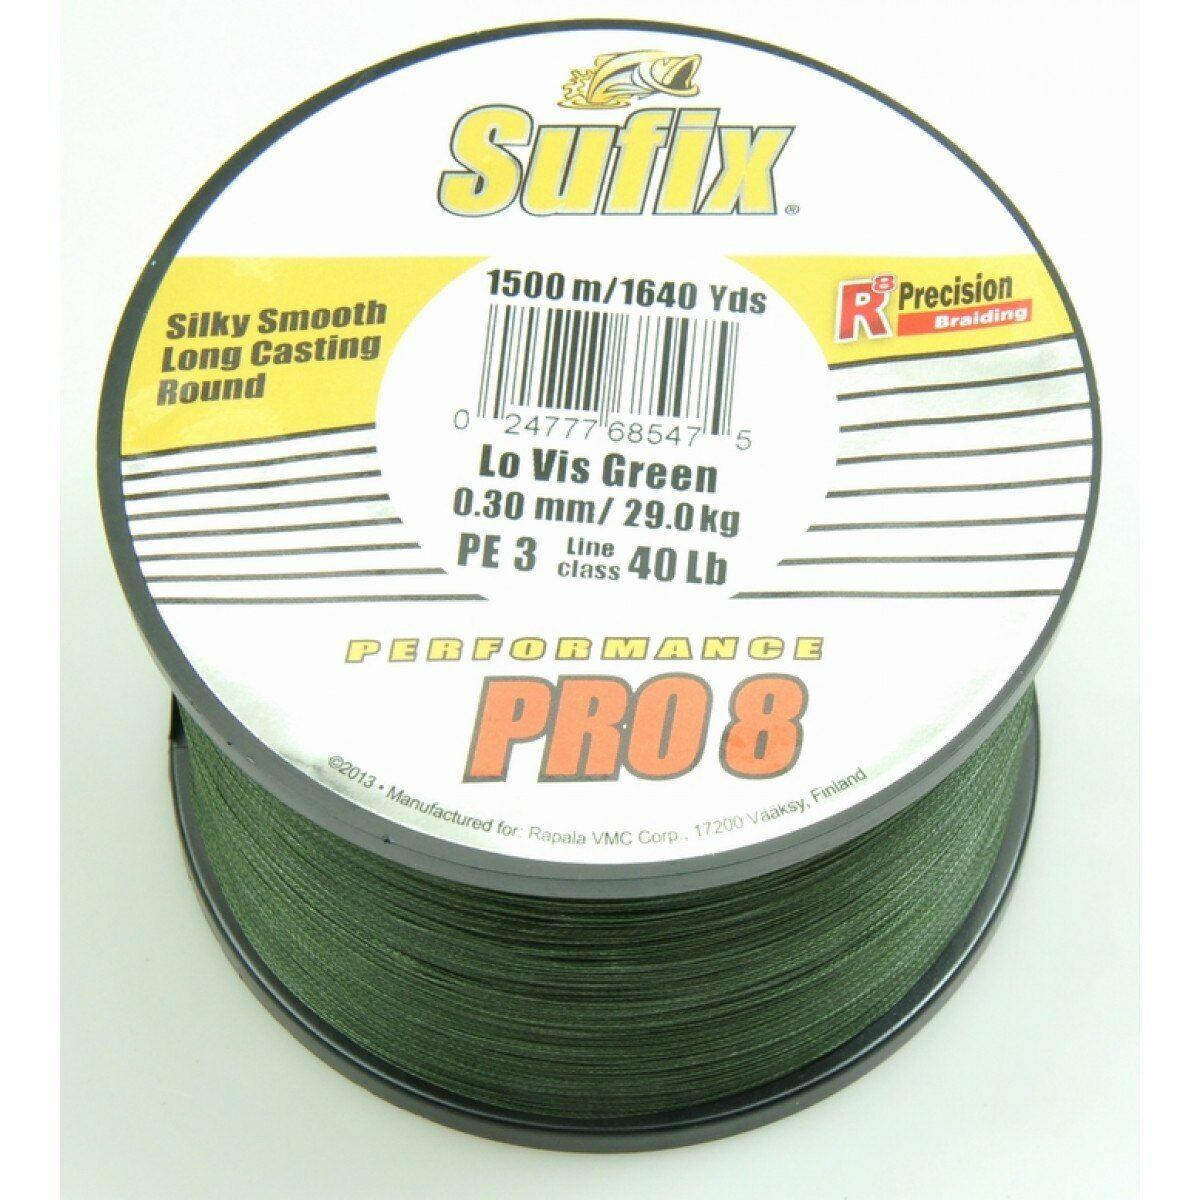 SUFIX Prestazioni Pro 8 LOW VIS verde 1500m Intrecciato Linea diametro varie